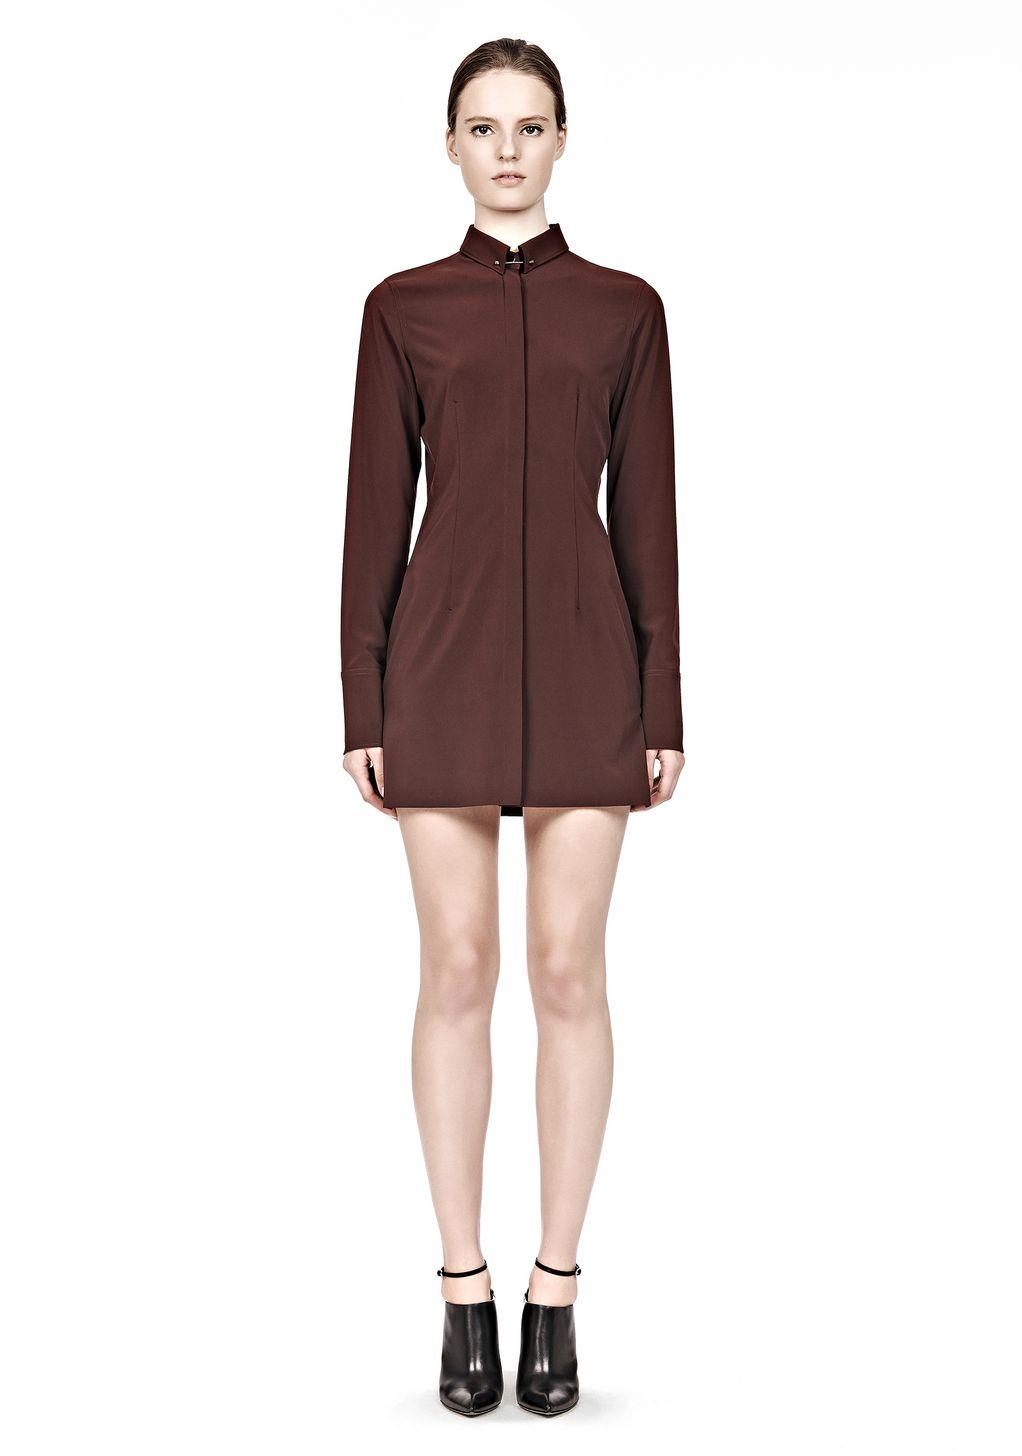 alexander wang fitted shirt dress with collar pin short dres